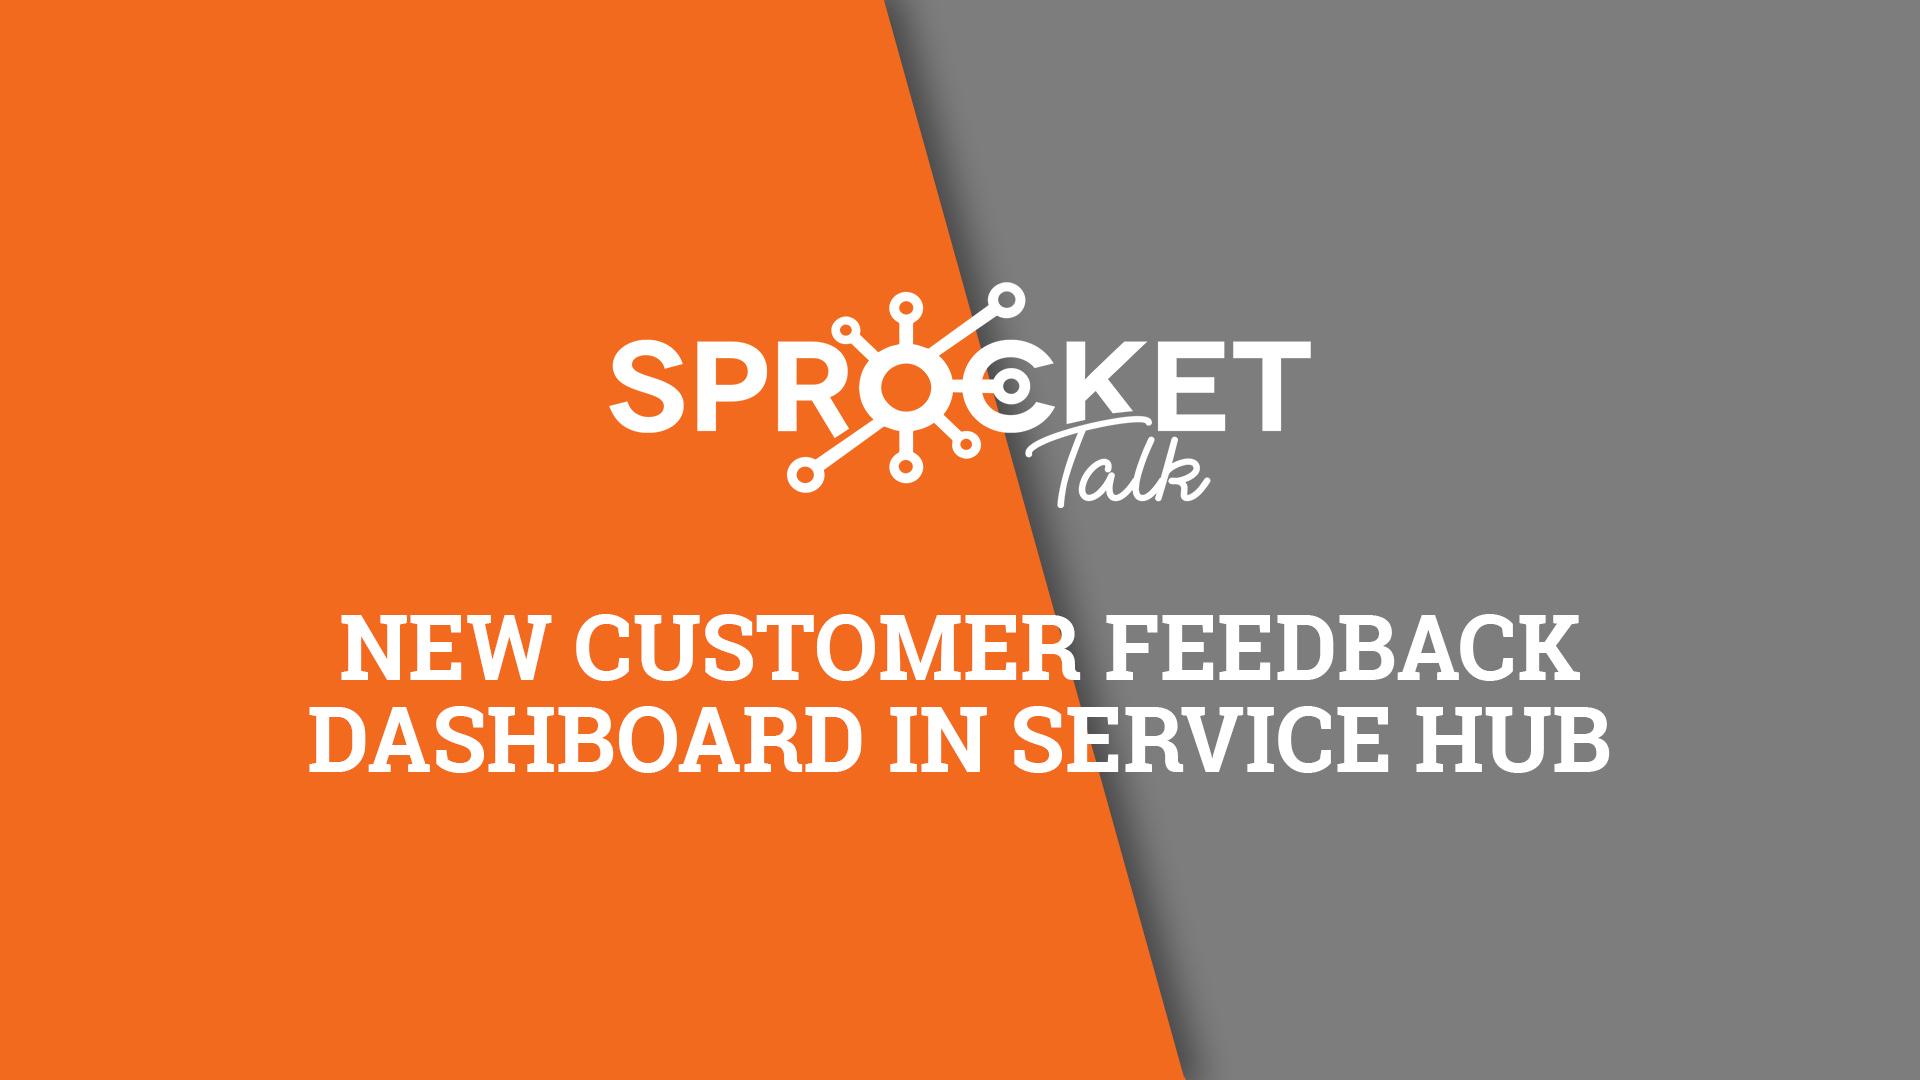 New Customer Feedback Dashboard in Service Hub